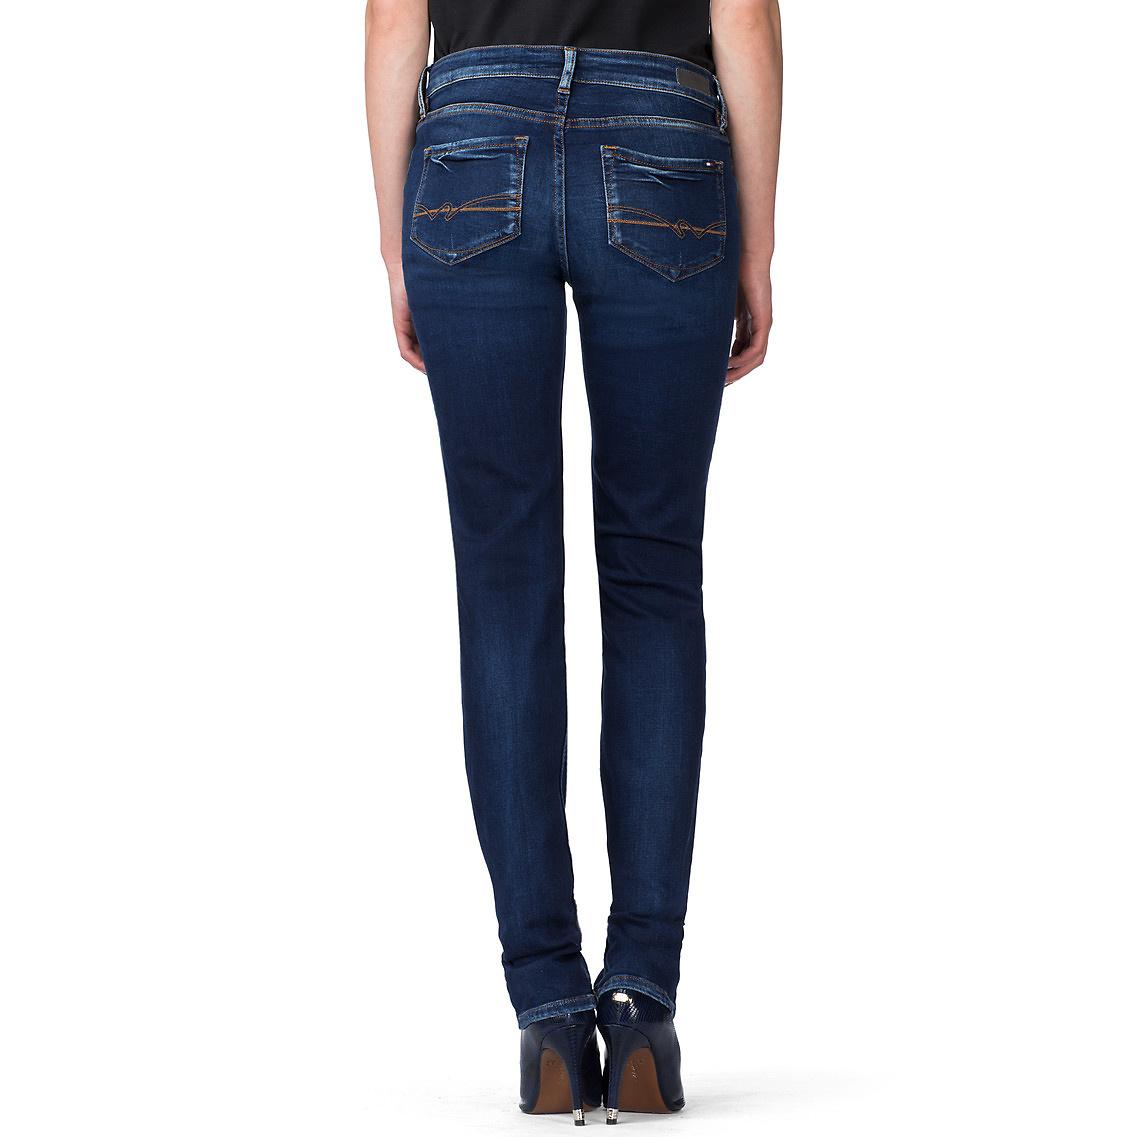 aa68200ea8e Tommy Hilfiger Madrid Straight Leg Jeans in Blue - Lyst